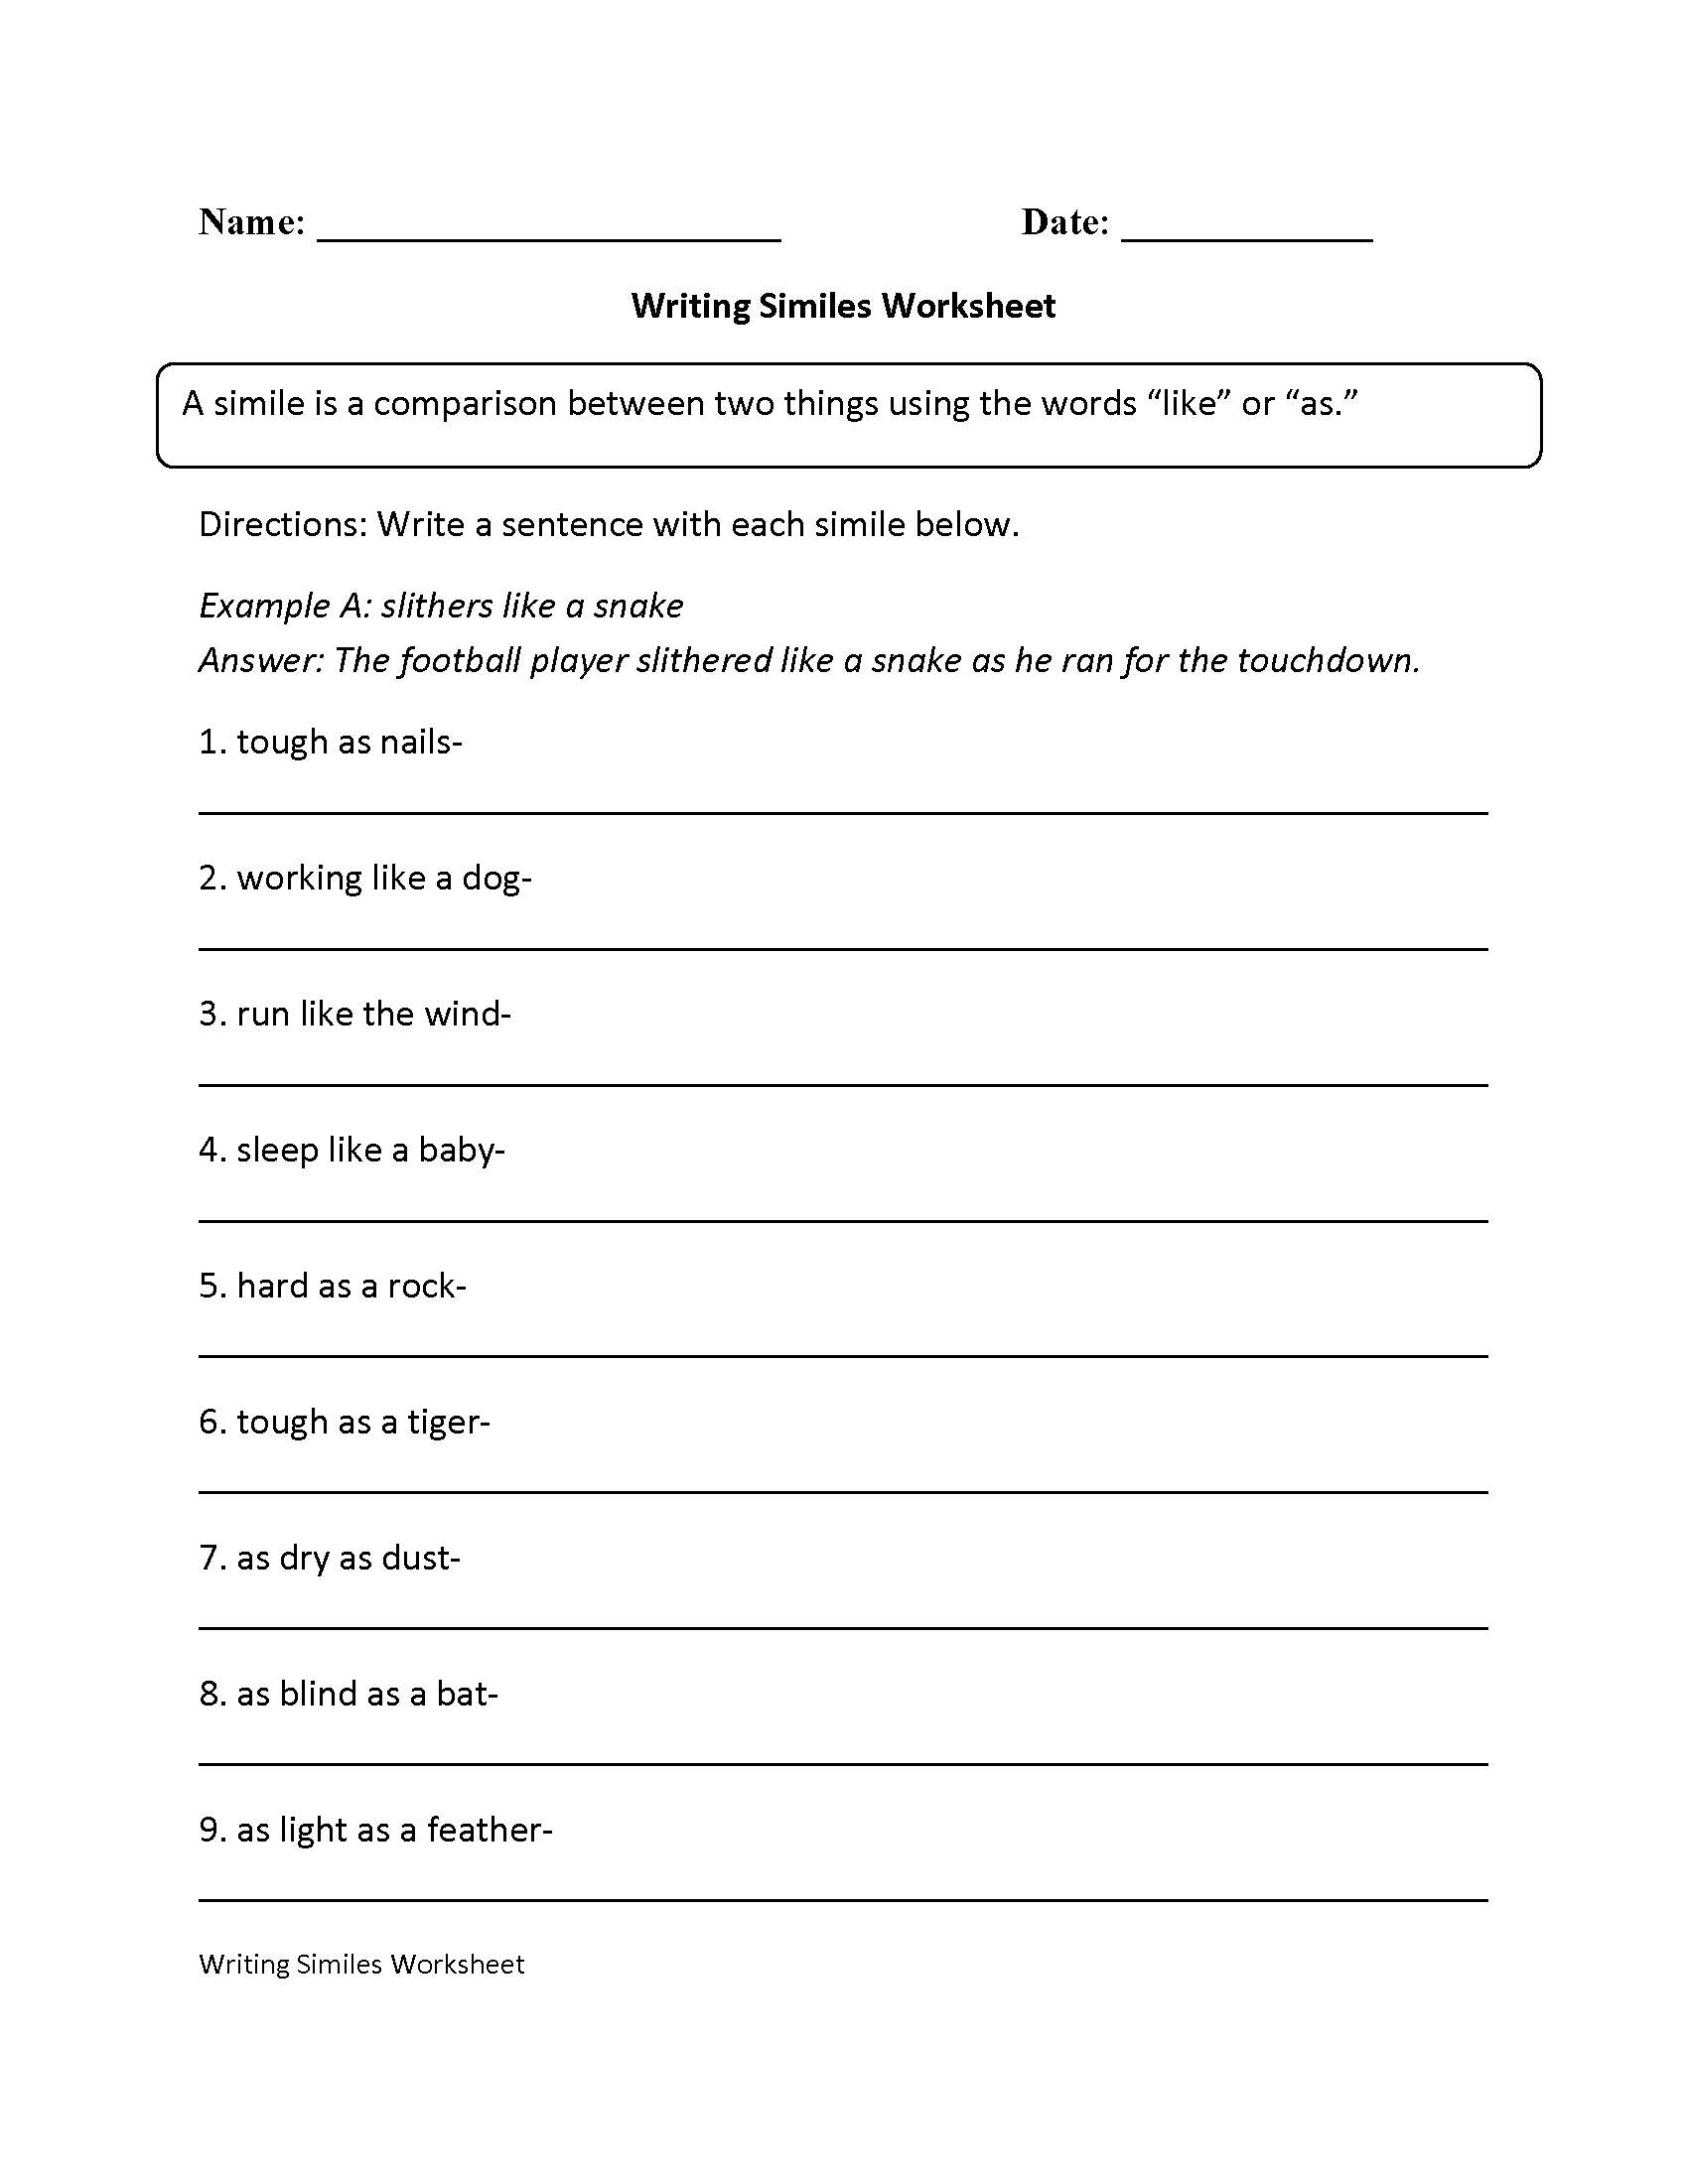 Simile Worksheets For Middle School The Best Worksheets Image